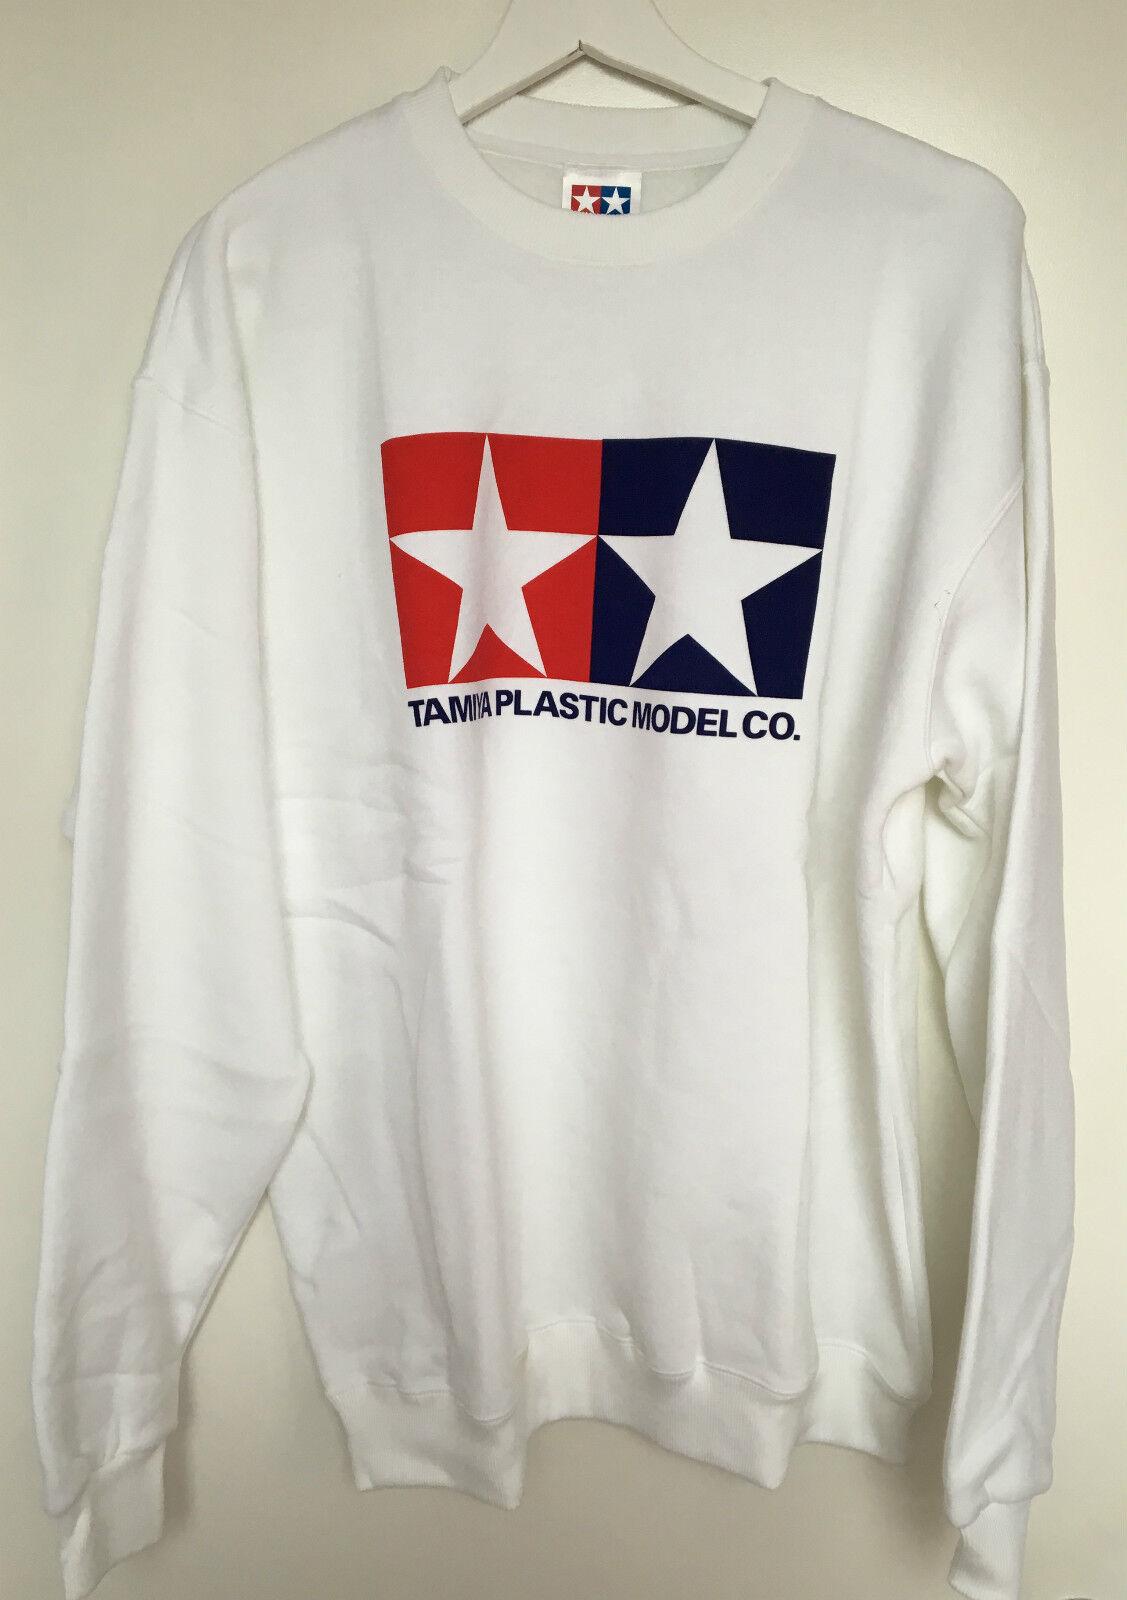 Tamiya 66859 Official Tamiya Logo White Jumper Sweatshirt Sweatshirt Sweatshirt Extra Large (XL) NEW ae1255